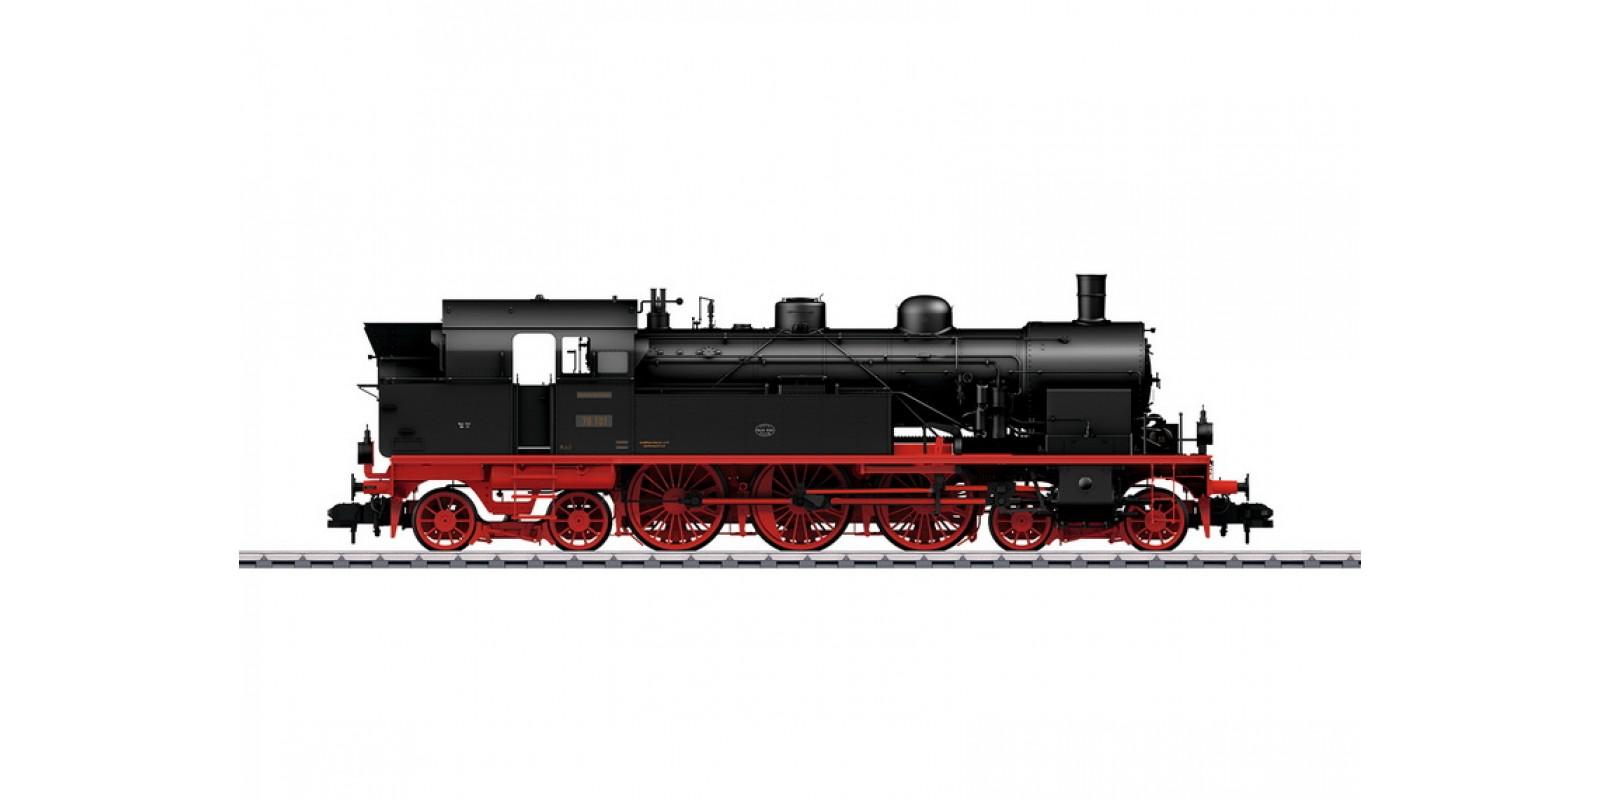 55072 Class 78 Steam Tank Locomotive